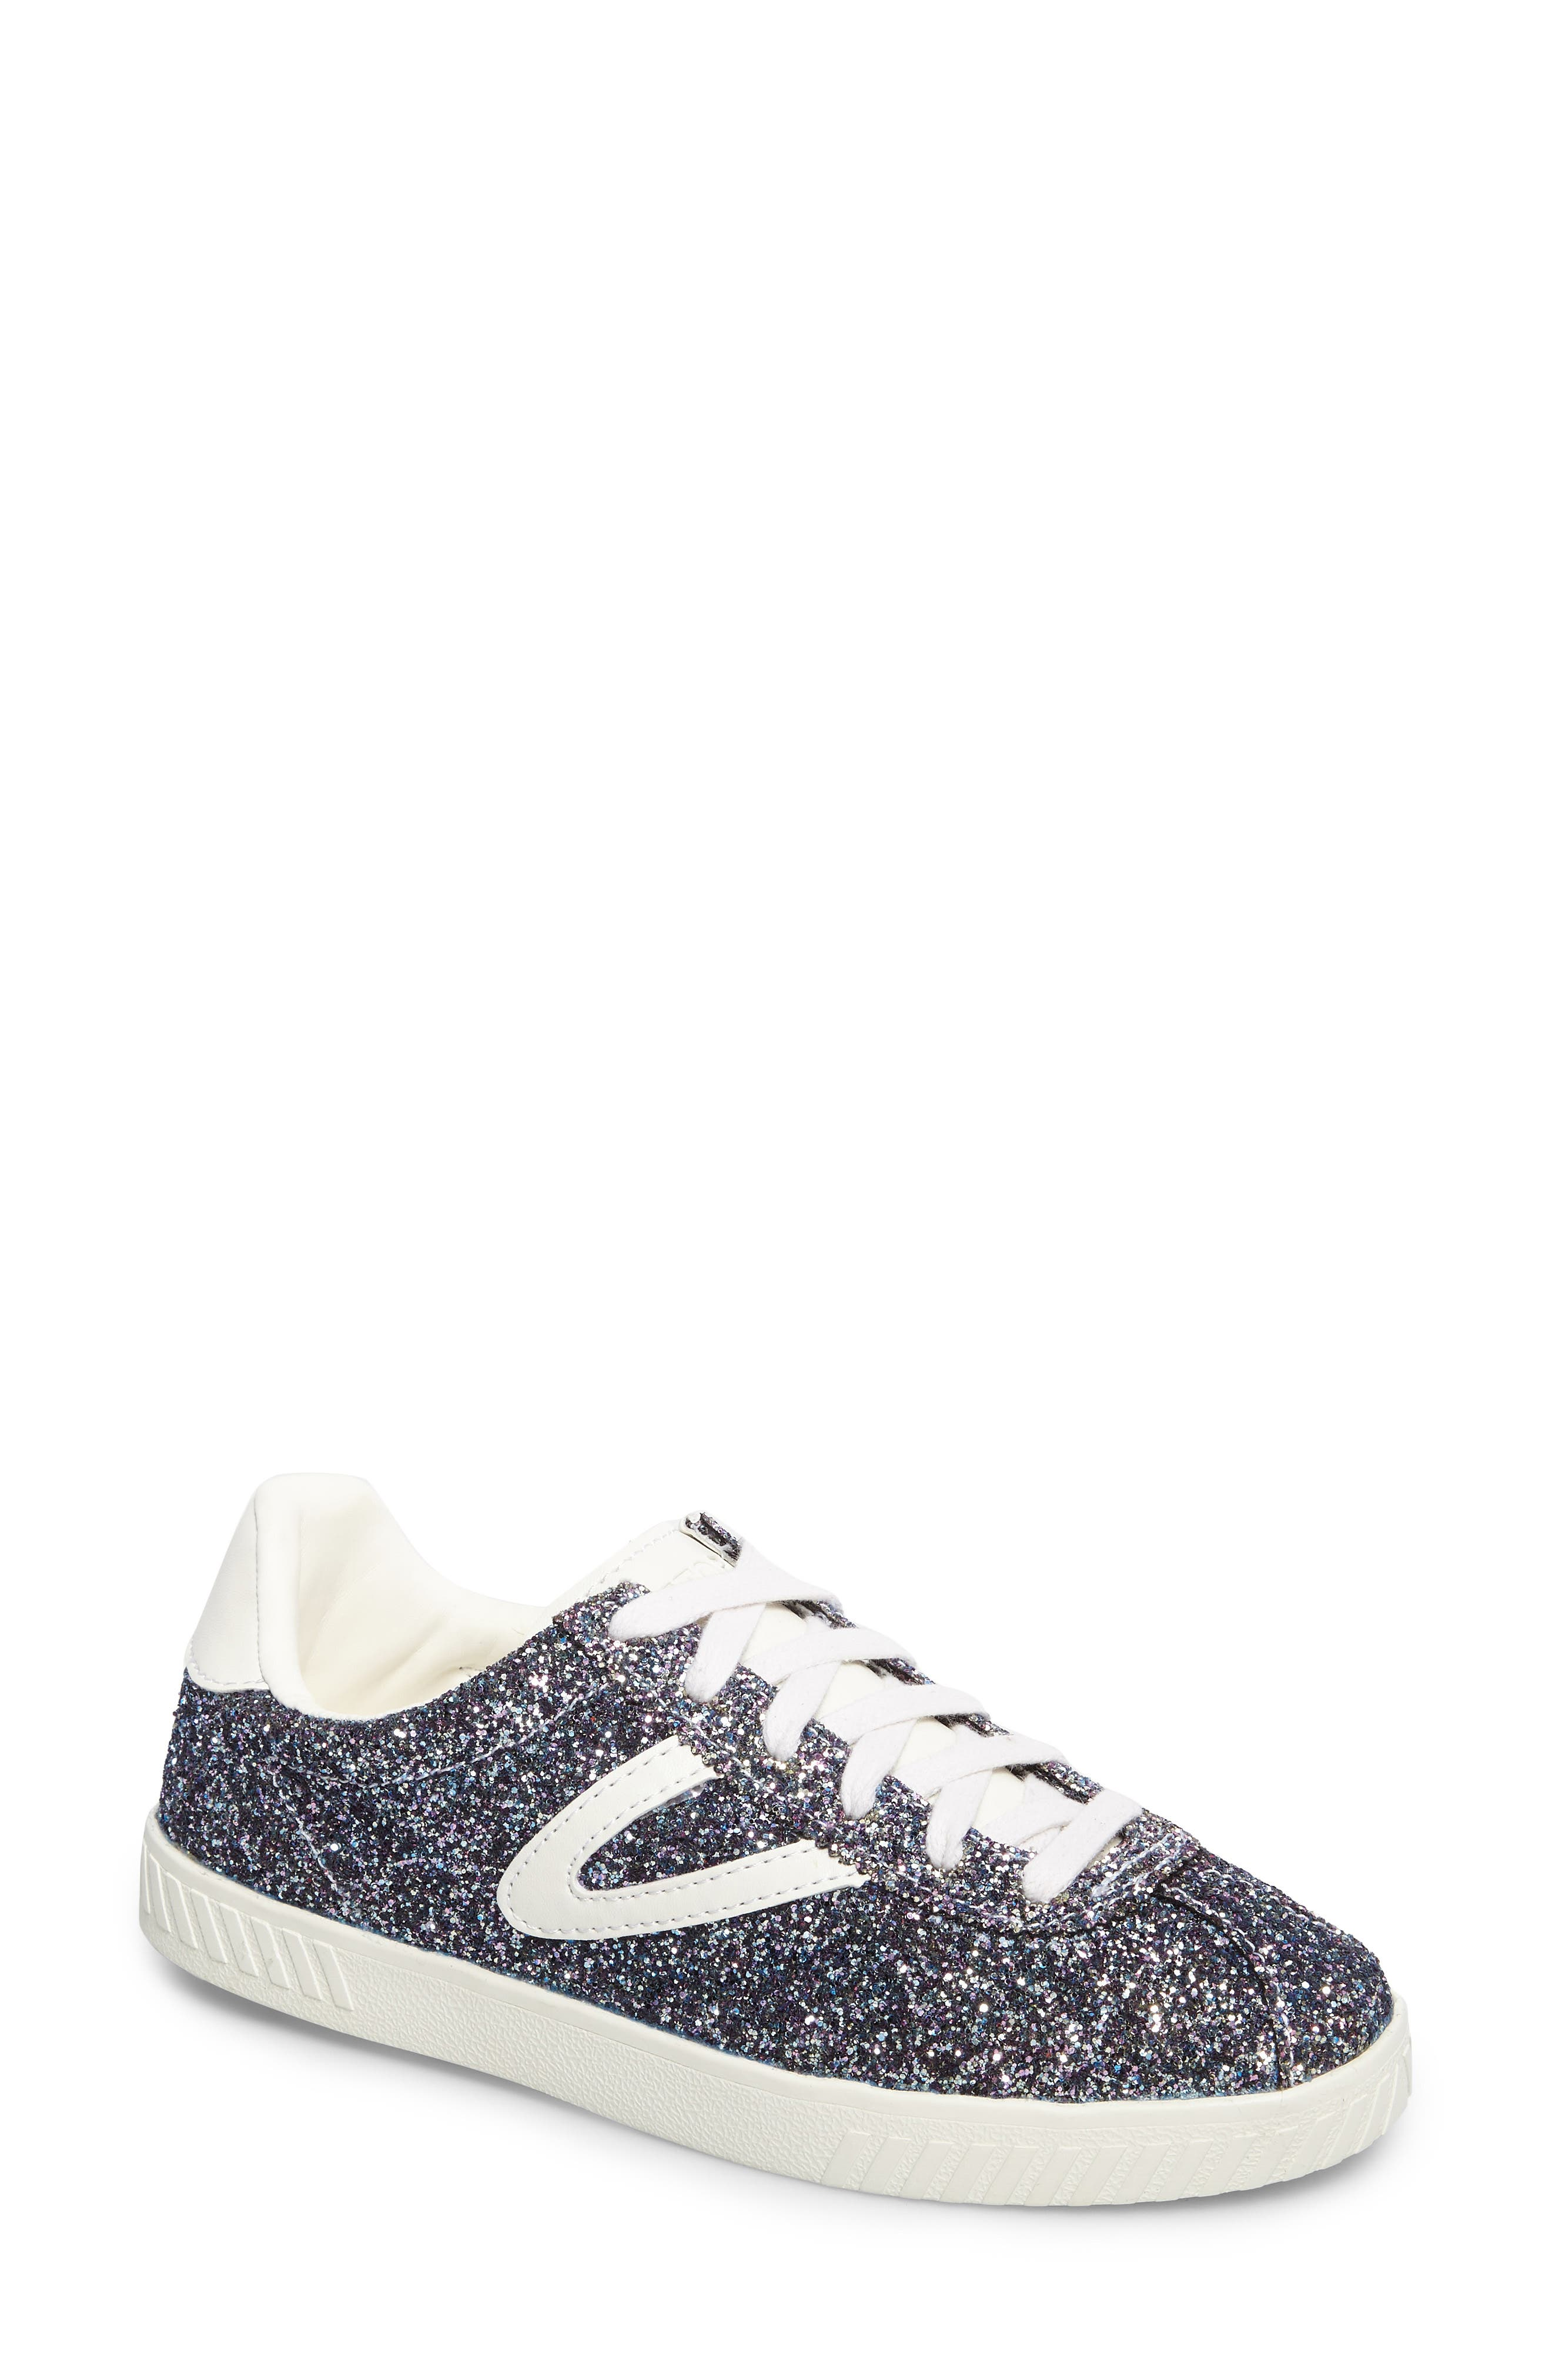 Camden 5 Sneaker,                         Main,                         color, Blue Multi/ White